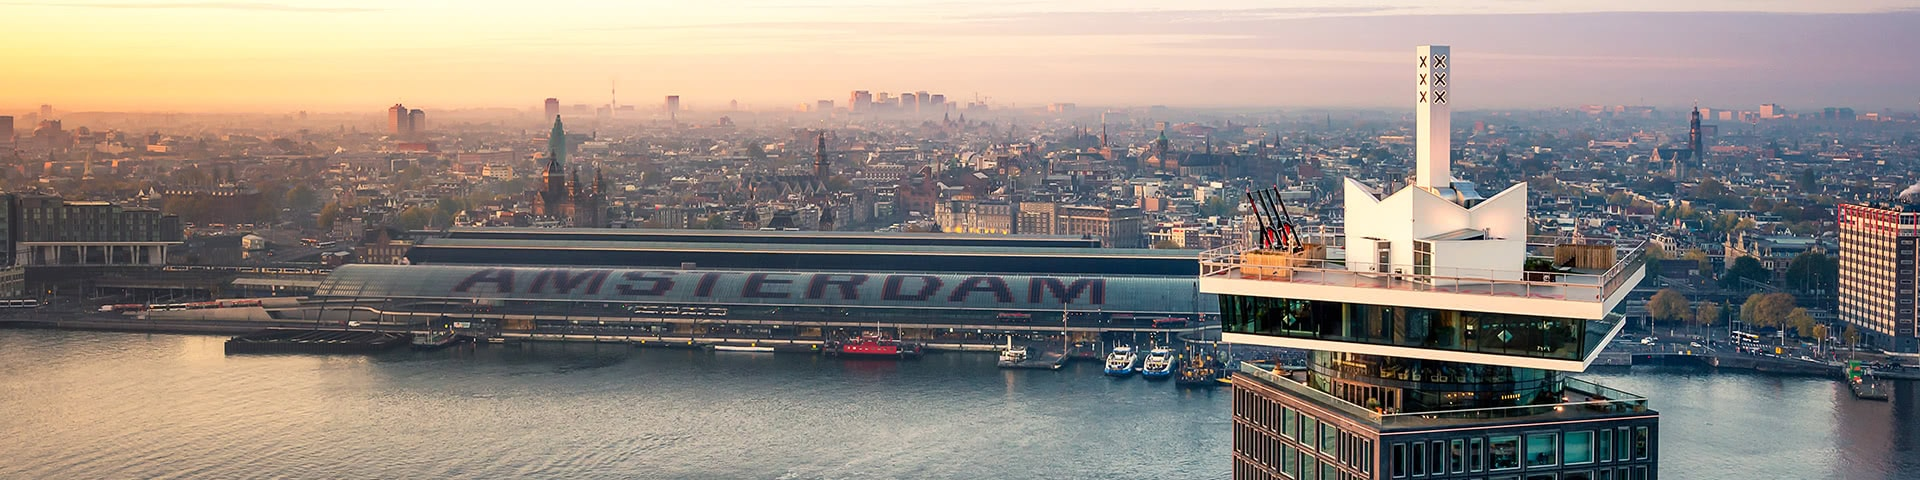 Amsterdam Lookout Tower Luftansicht